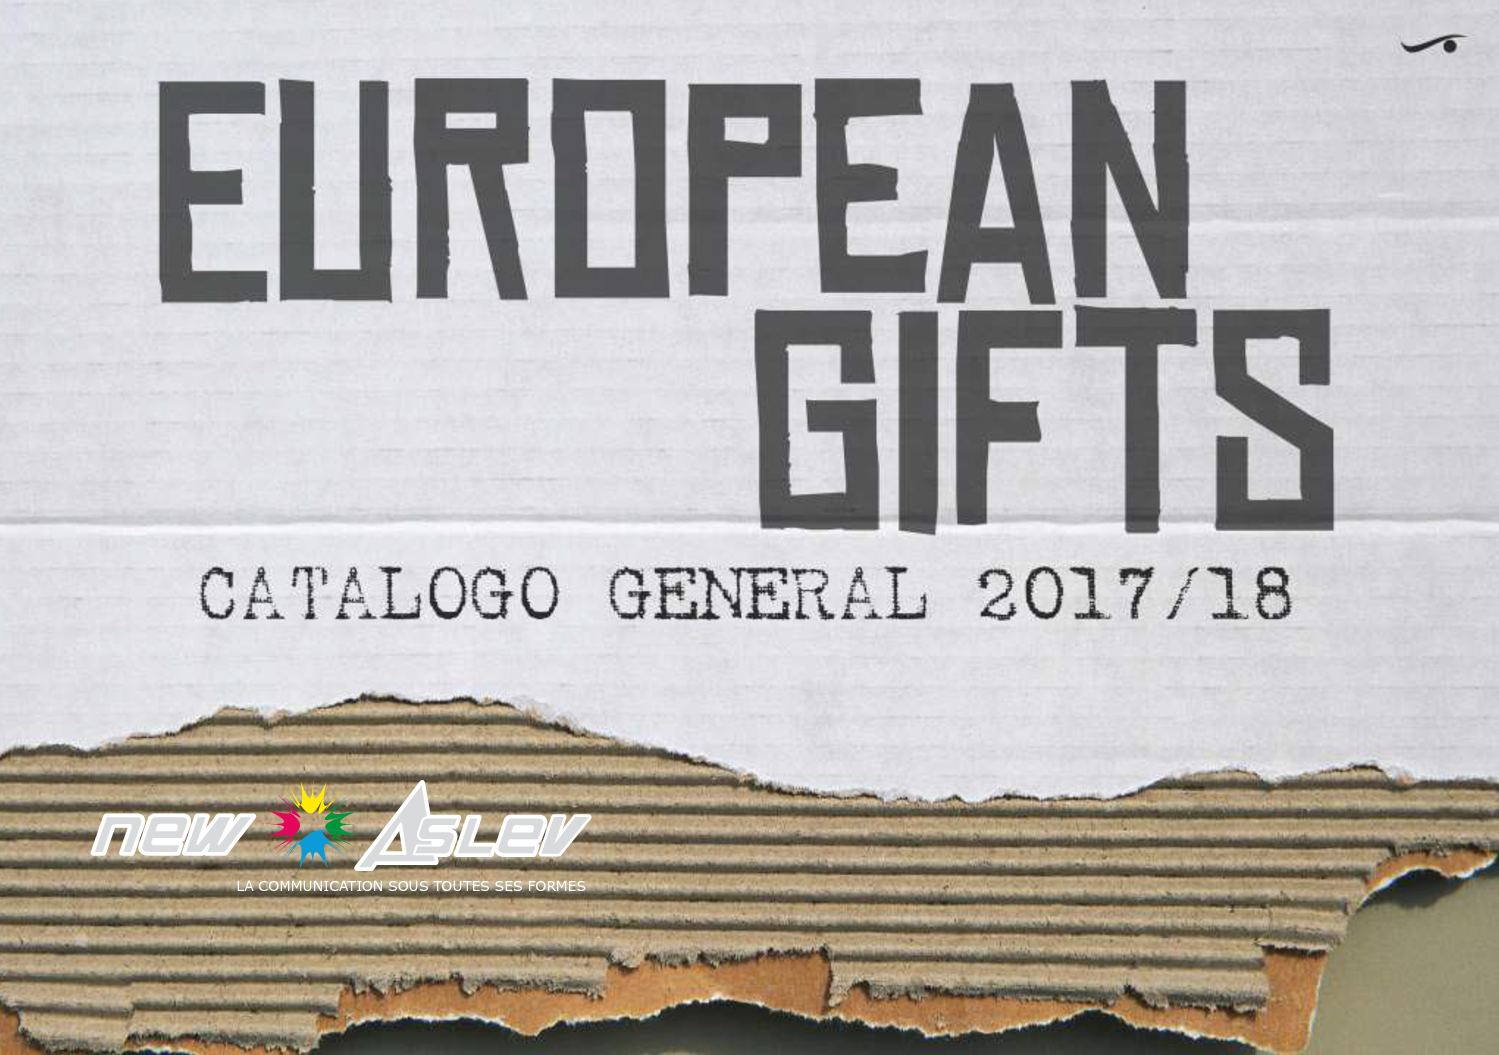 Calaméo - European Gifts 2017 2018